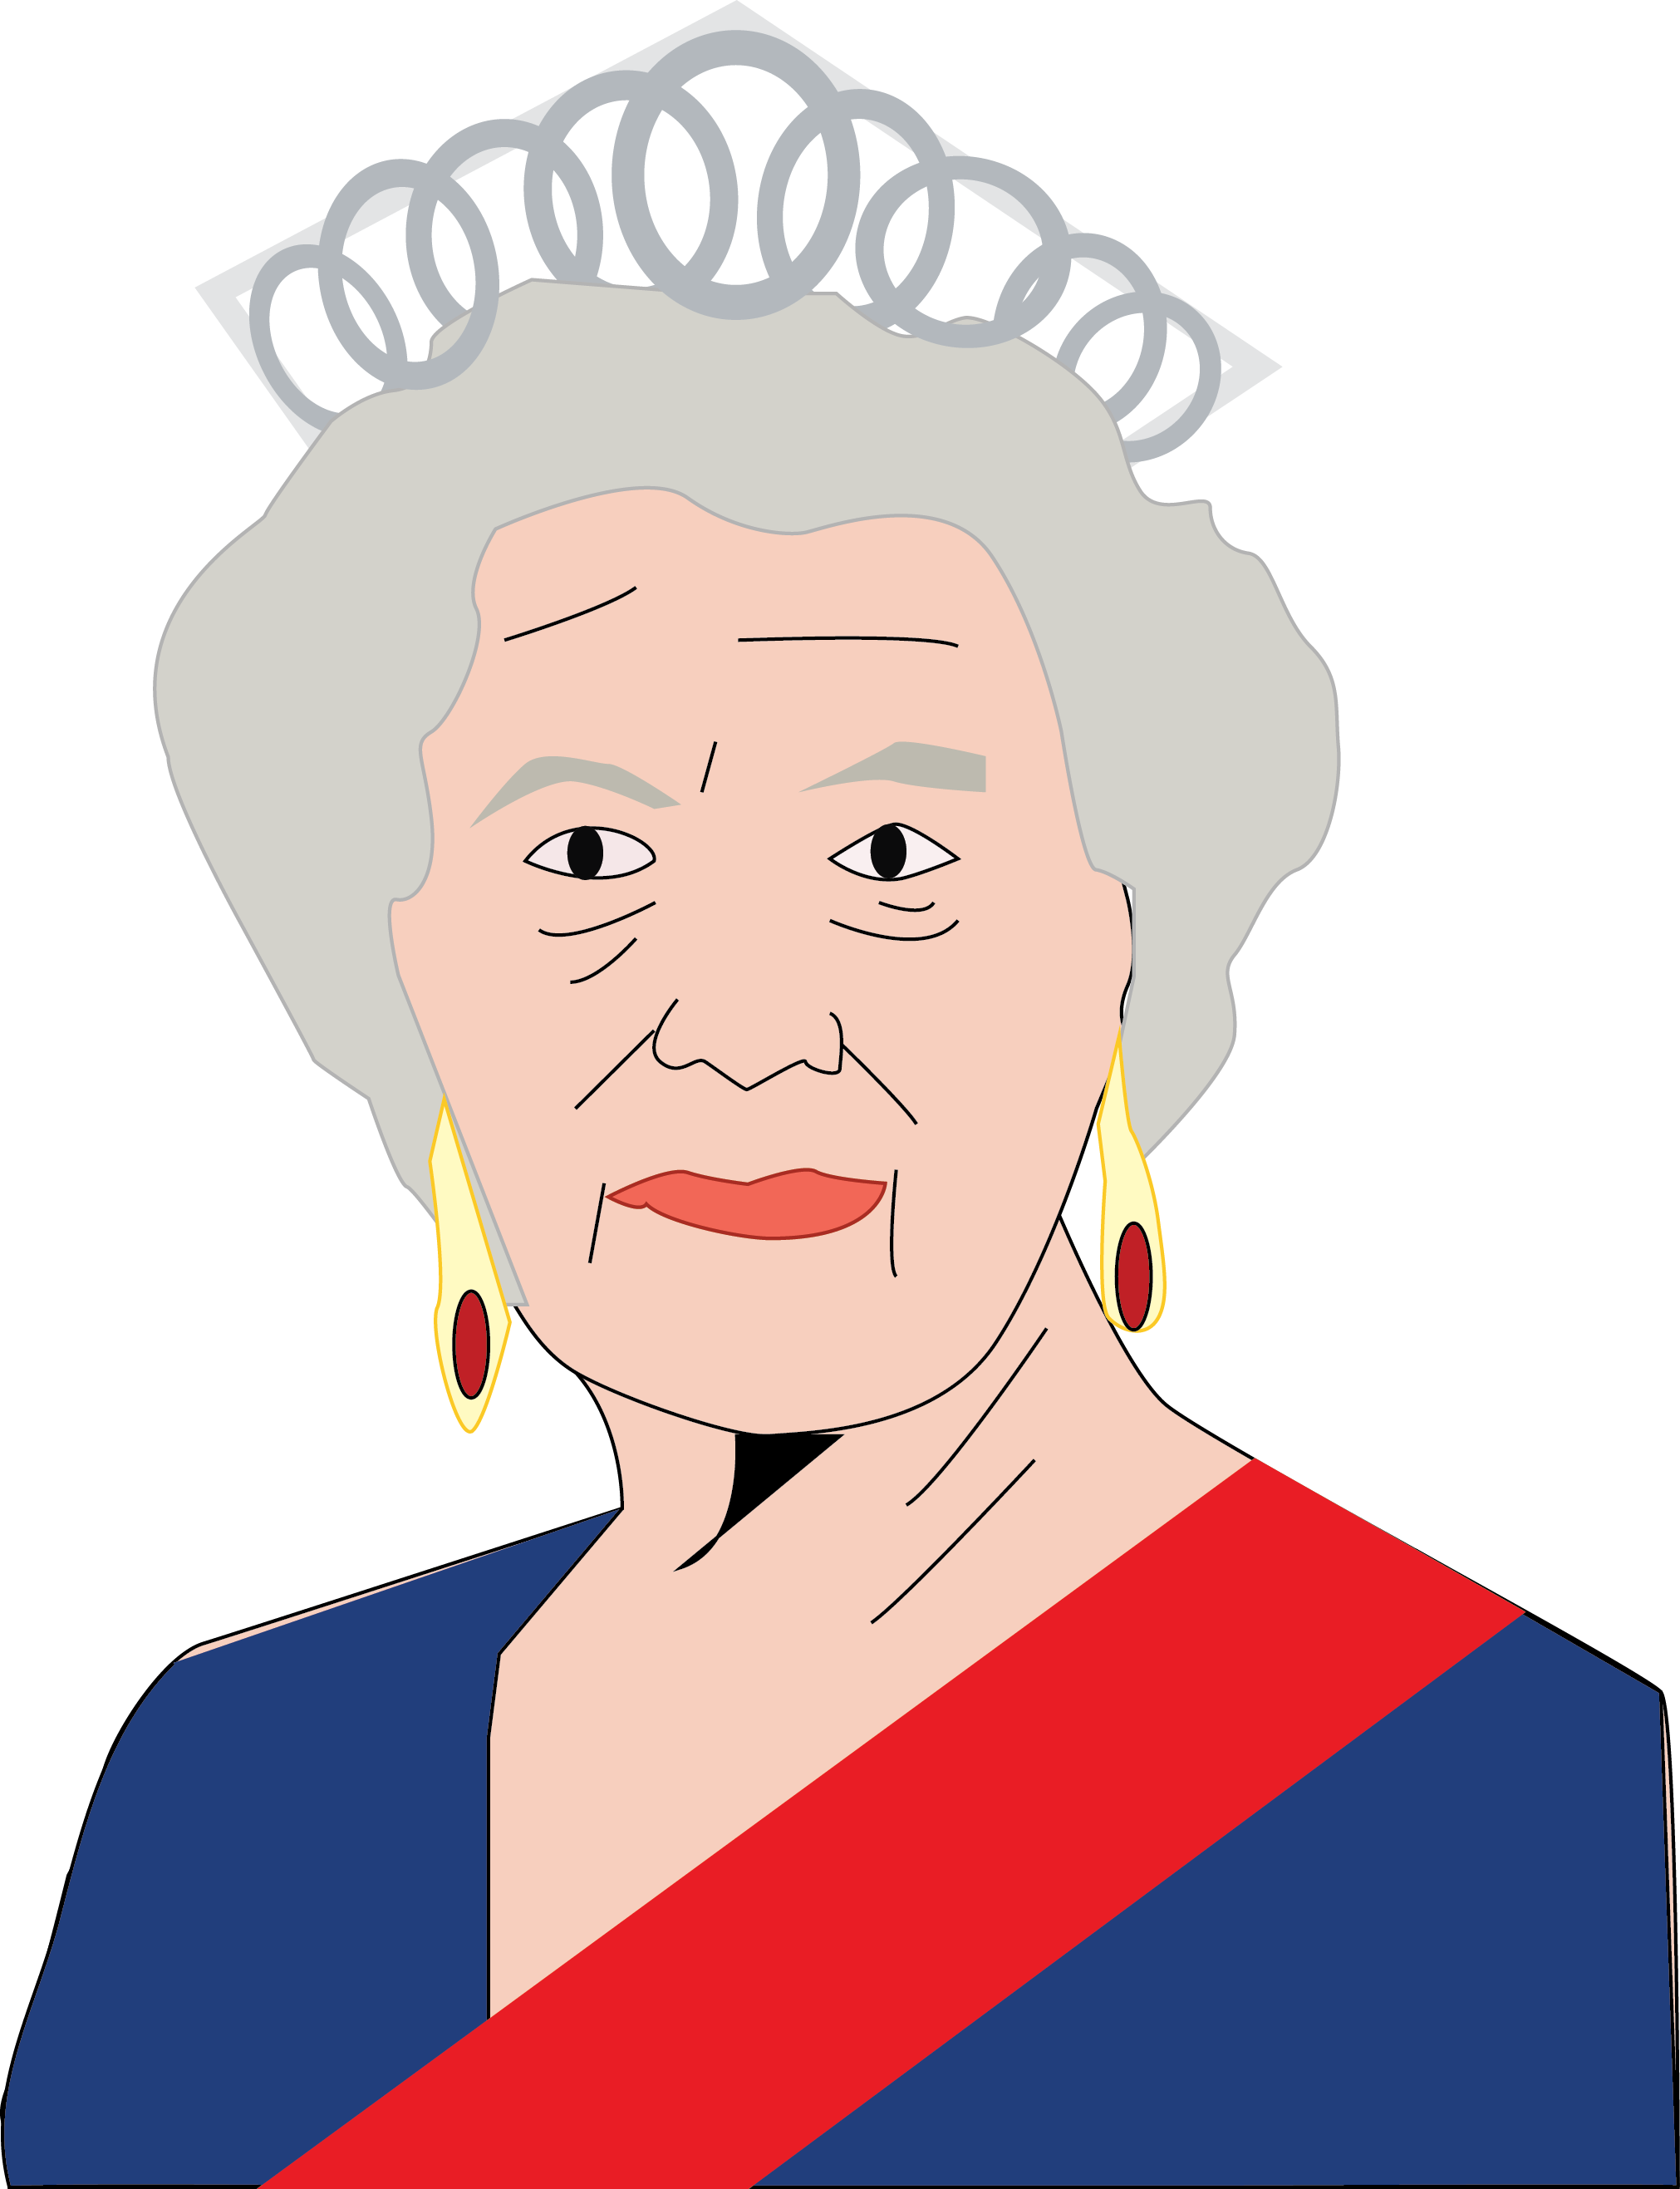 The Royals Queen Elizabeth Graphic Design Portfolio Portfolio Design Royal Queen